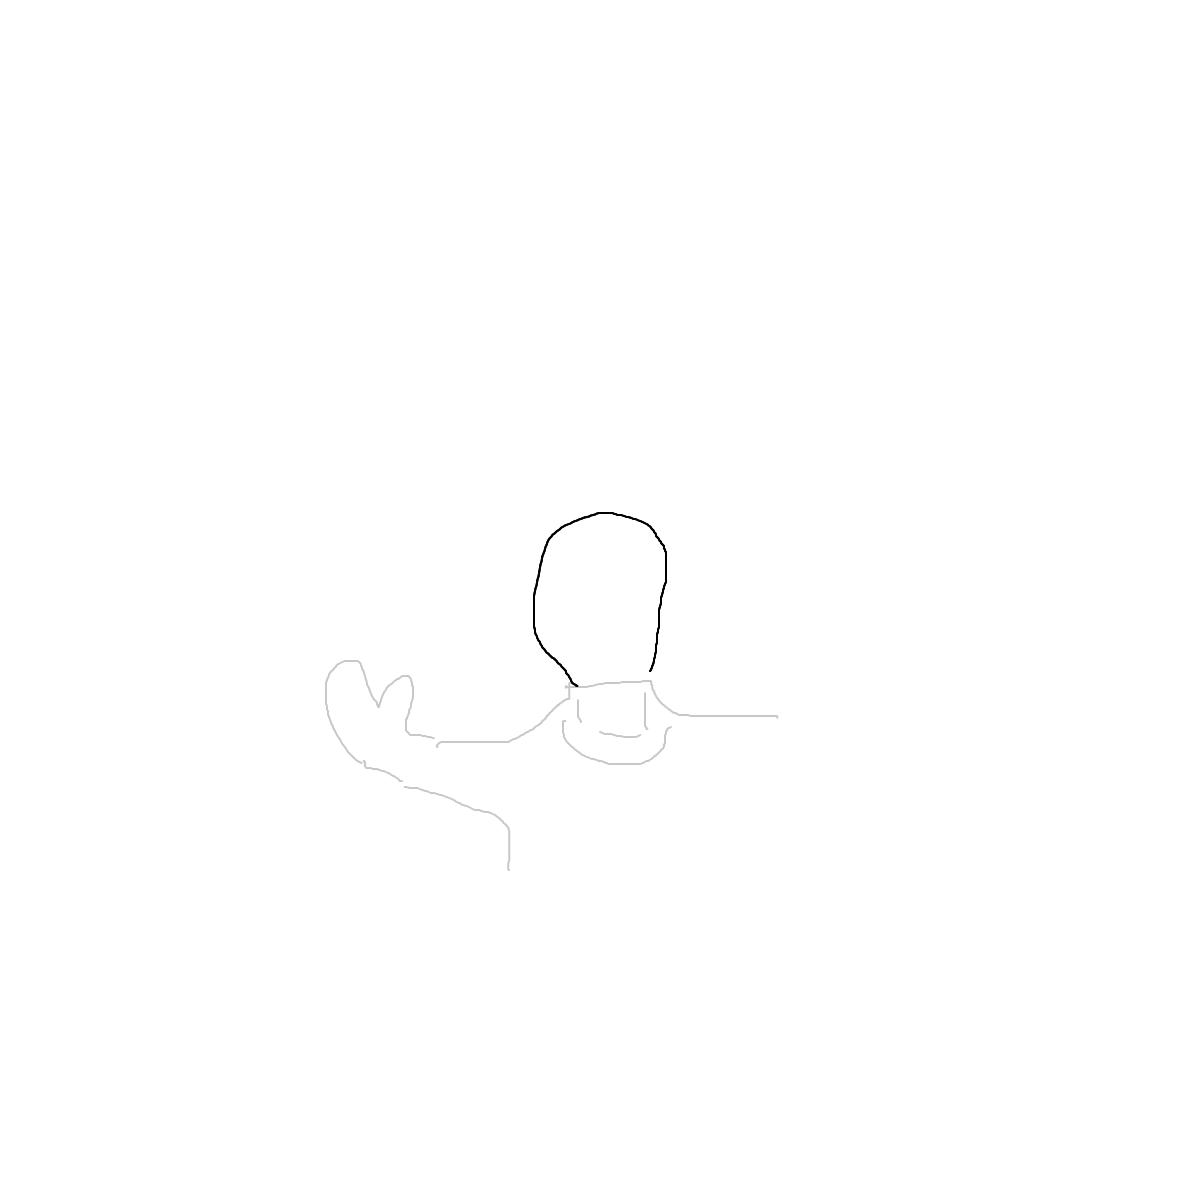 BAAAM drawing#5250 lat:39.9655990600585940lng: -75.1809158325195300